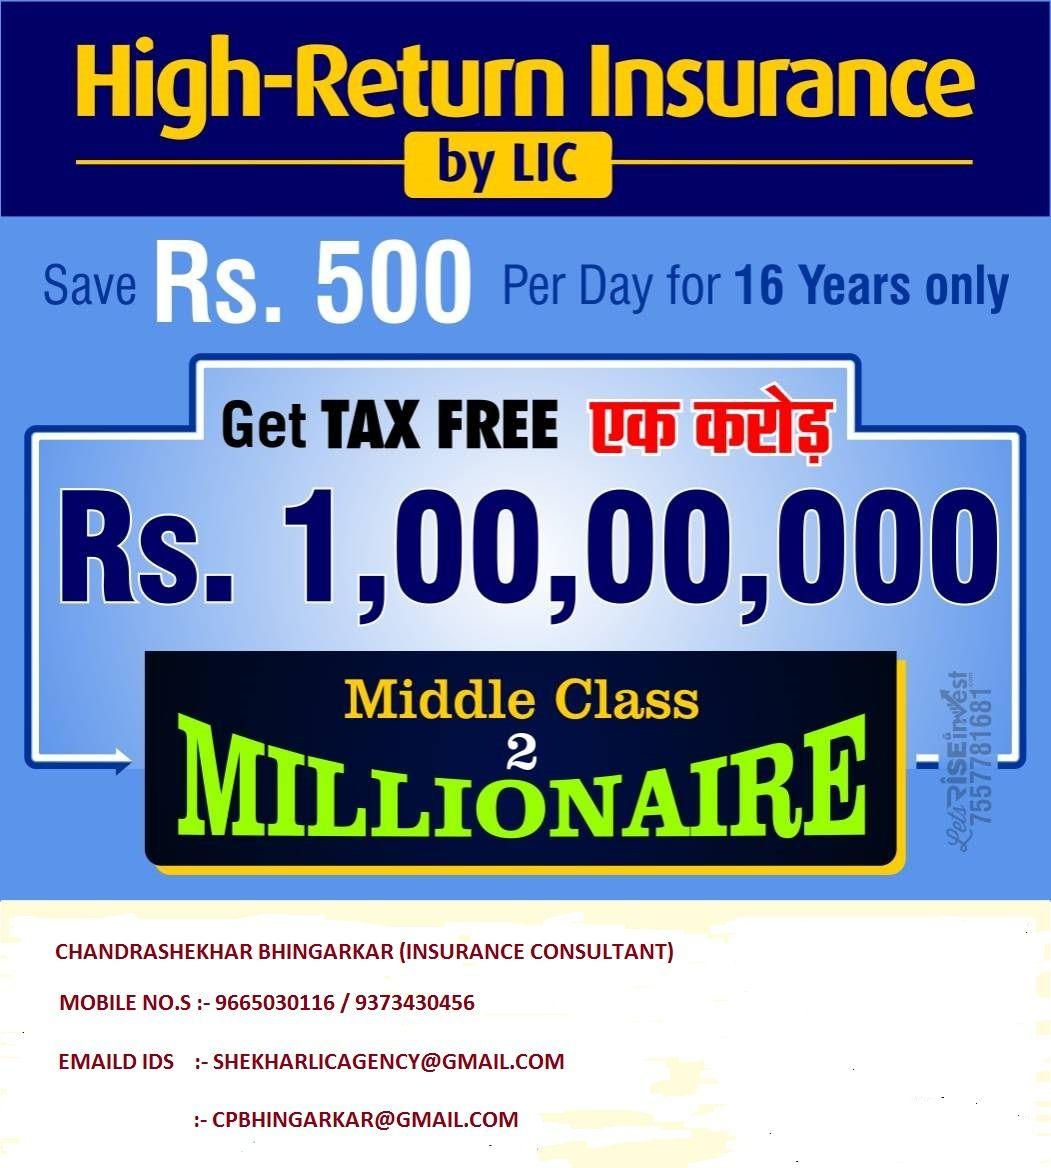 High Return Insurance Insurance Life Insurance Life